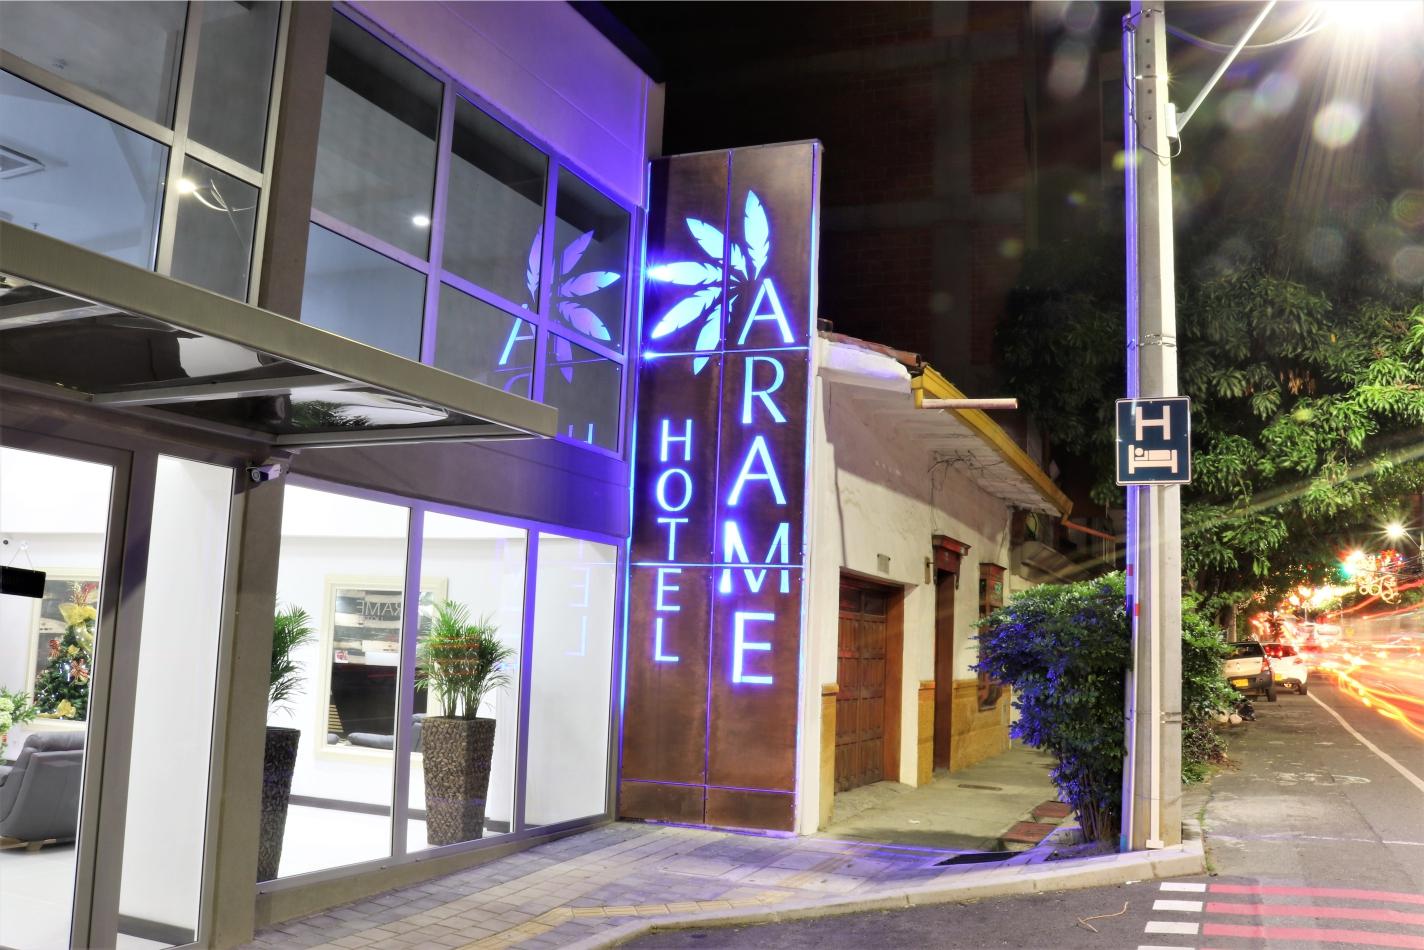 IM 21 Galeria Hotel Arame